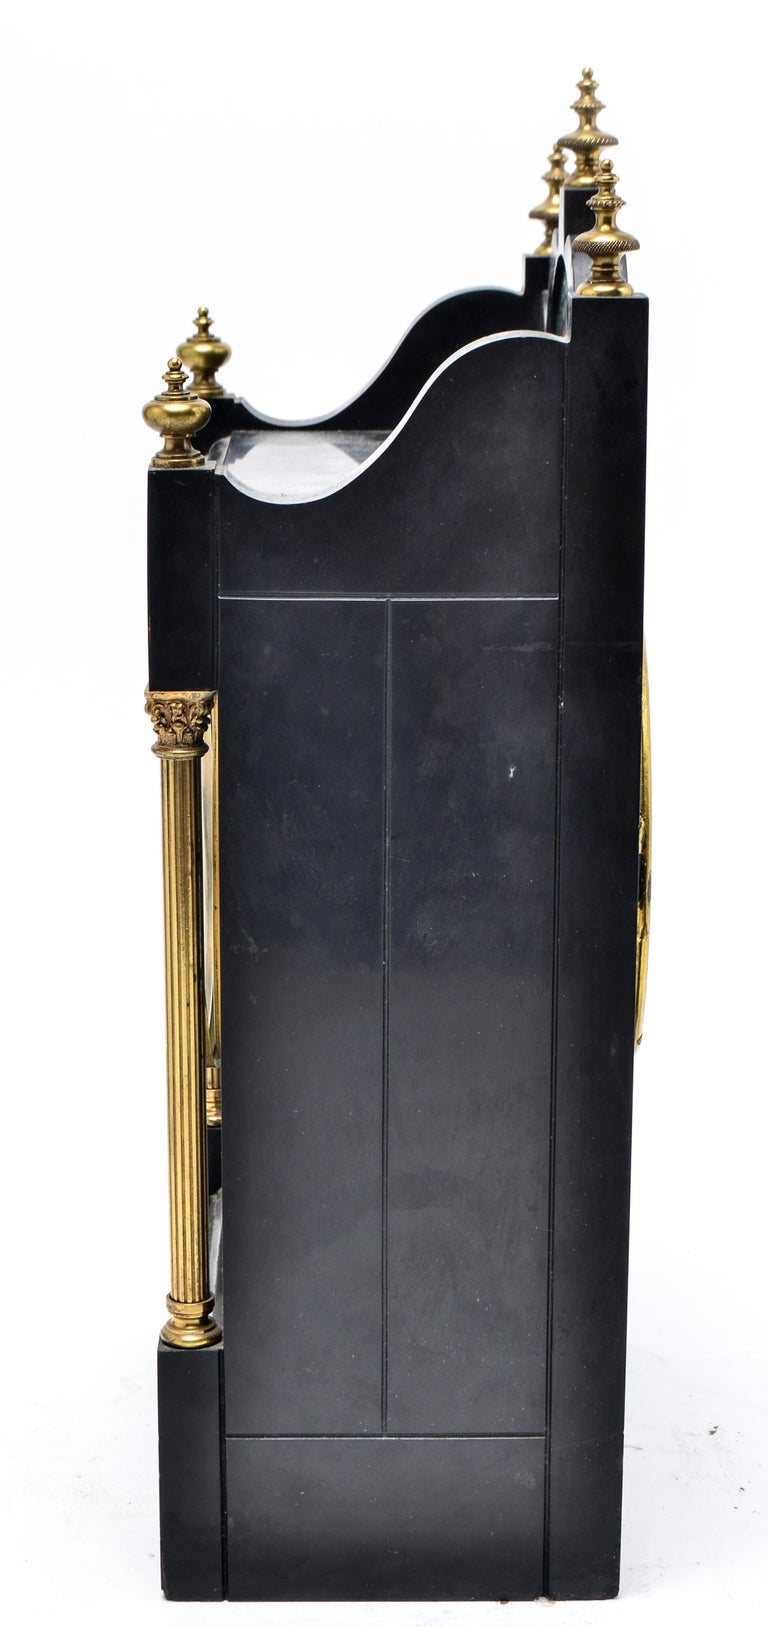 Eastlake Mantel Clock in Black Marble and Enamel For Sale 2